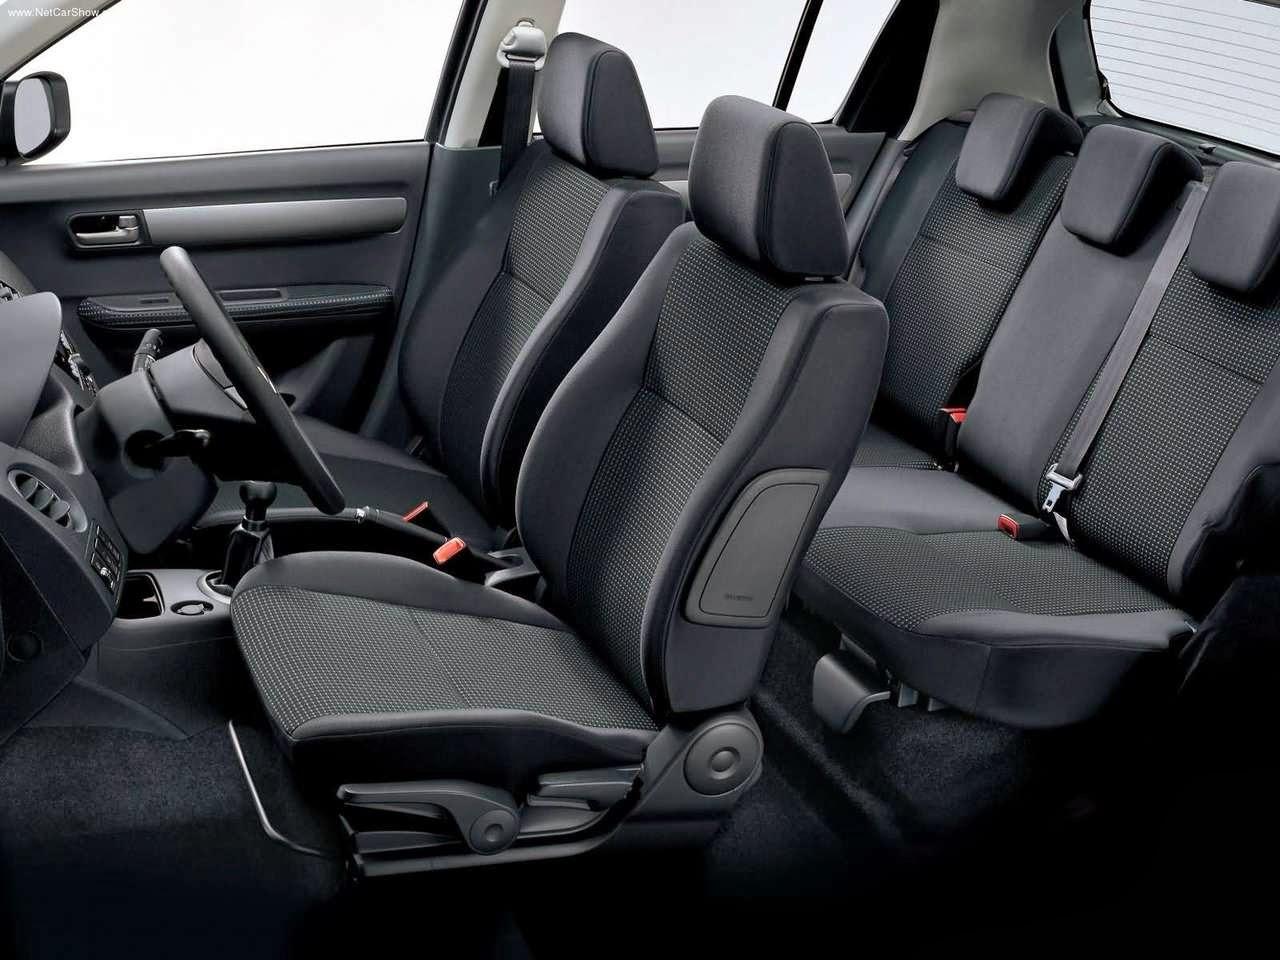 sports cars suzuki swift interior. Black Bedroom Furniture Sets. Home Design Ideas